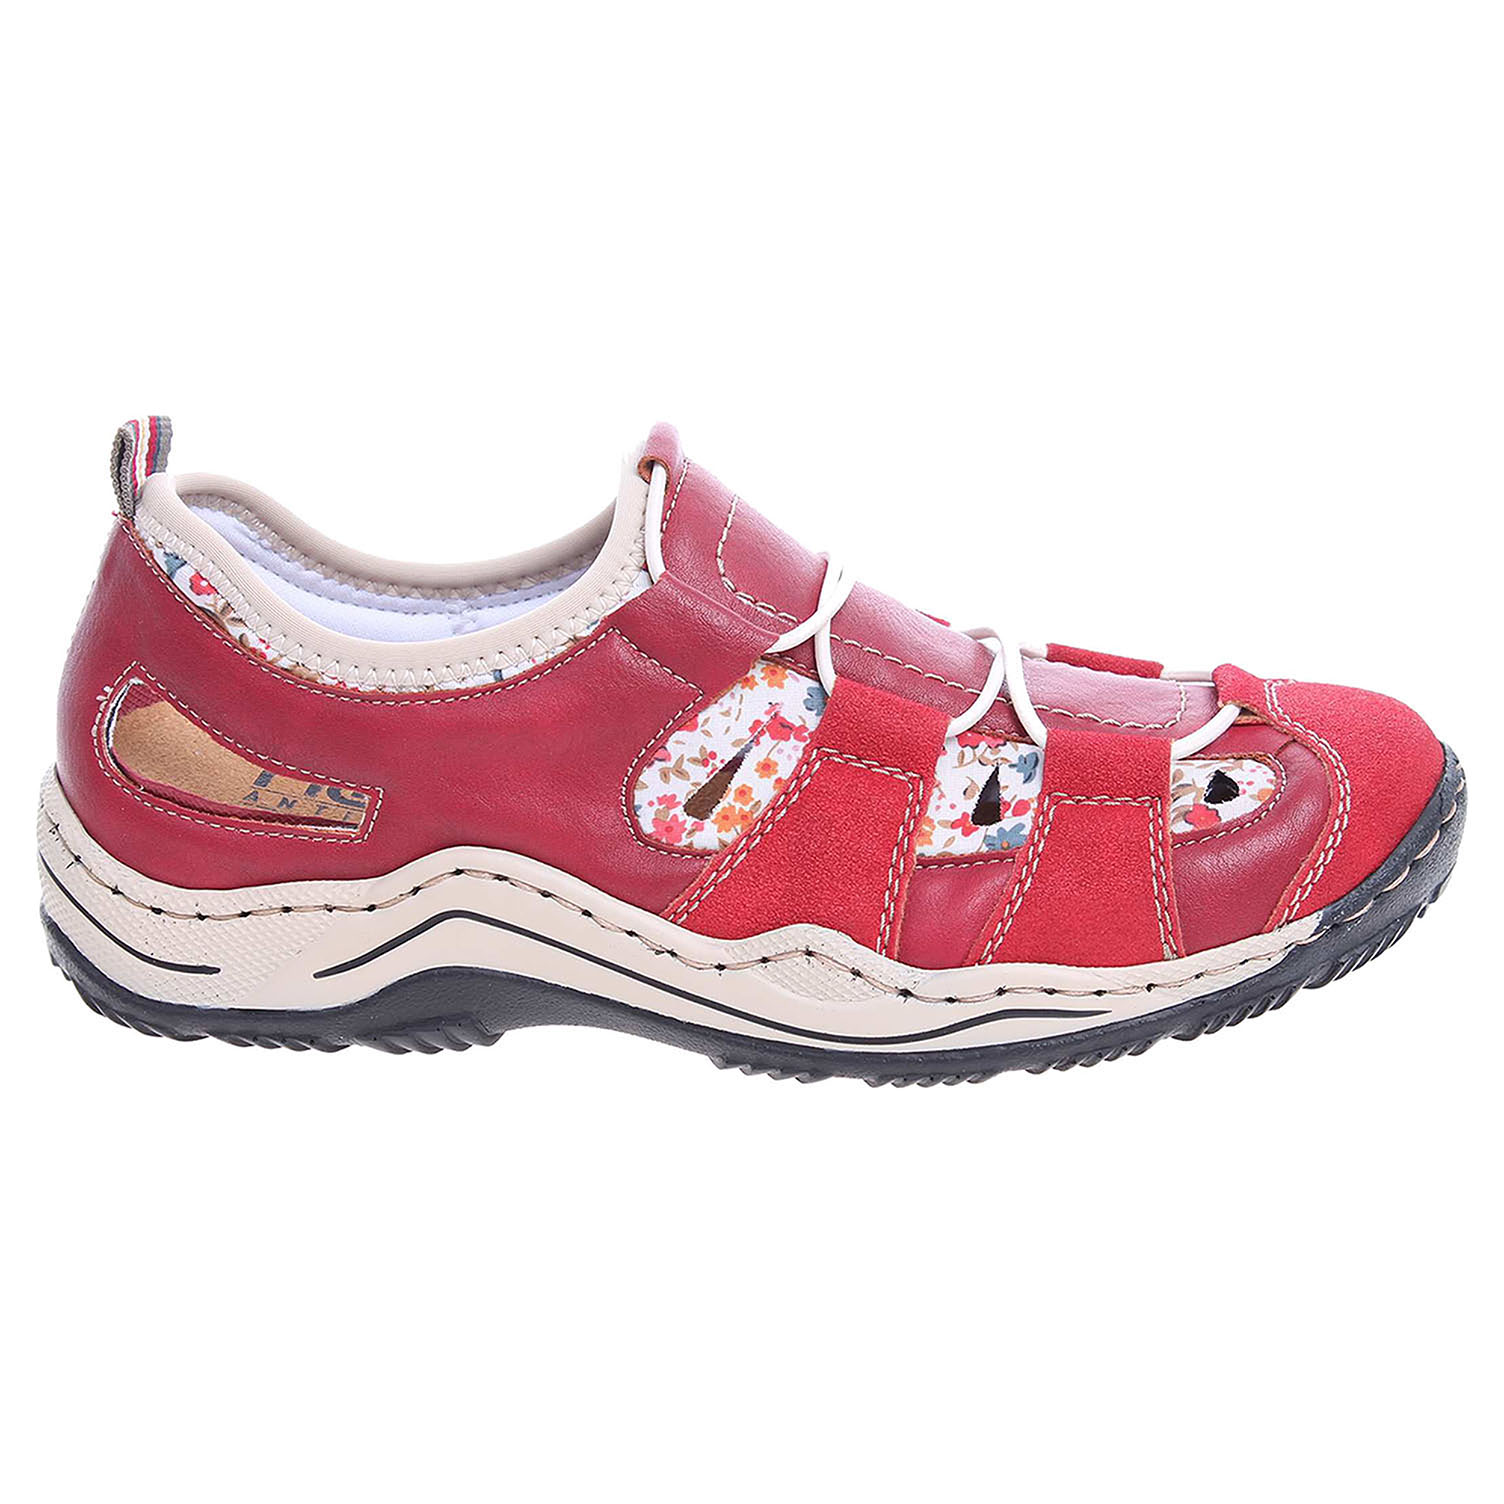 Ecco Rieker dámské sandály L0561-33 červené 23800994